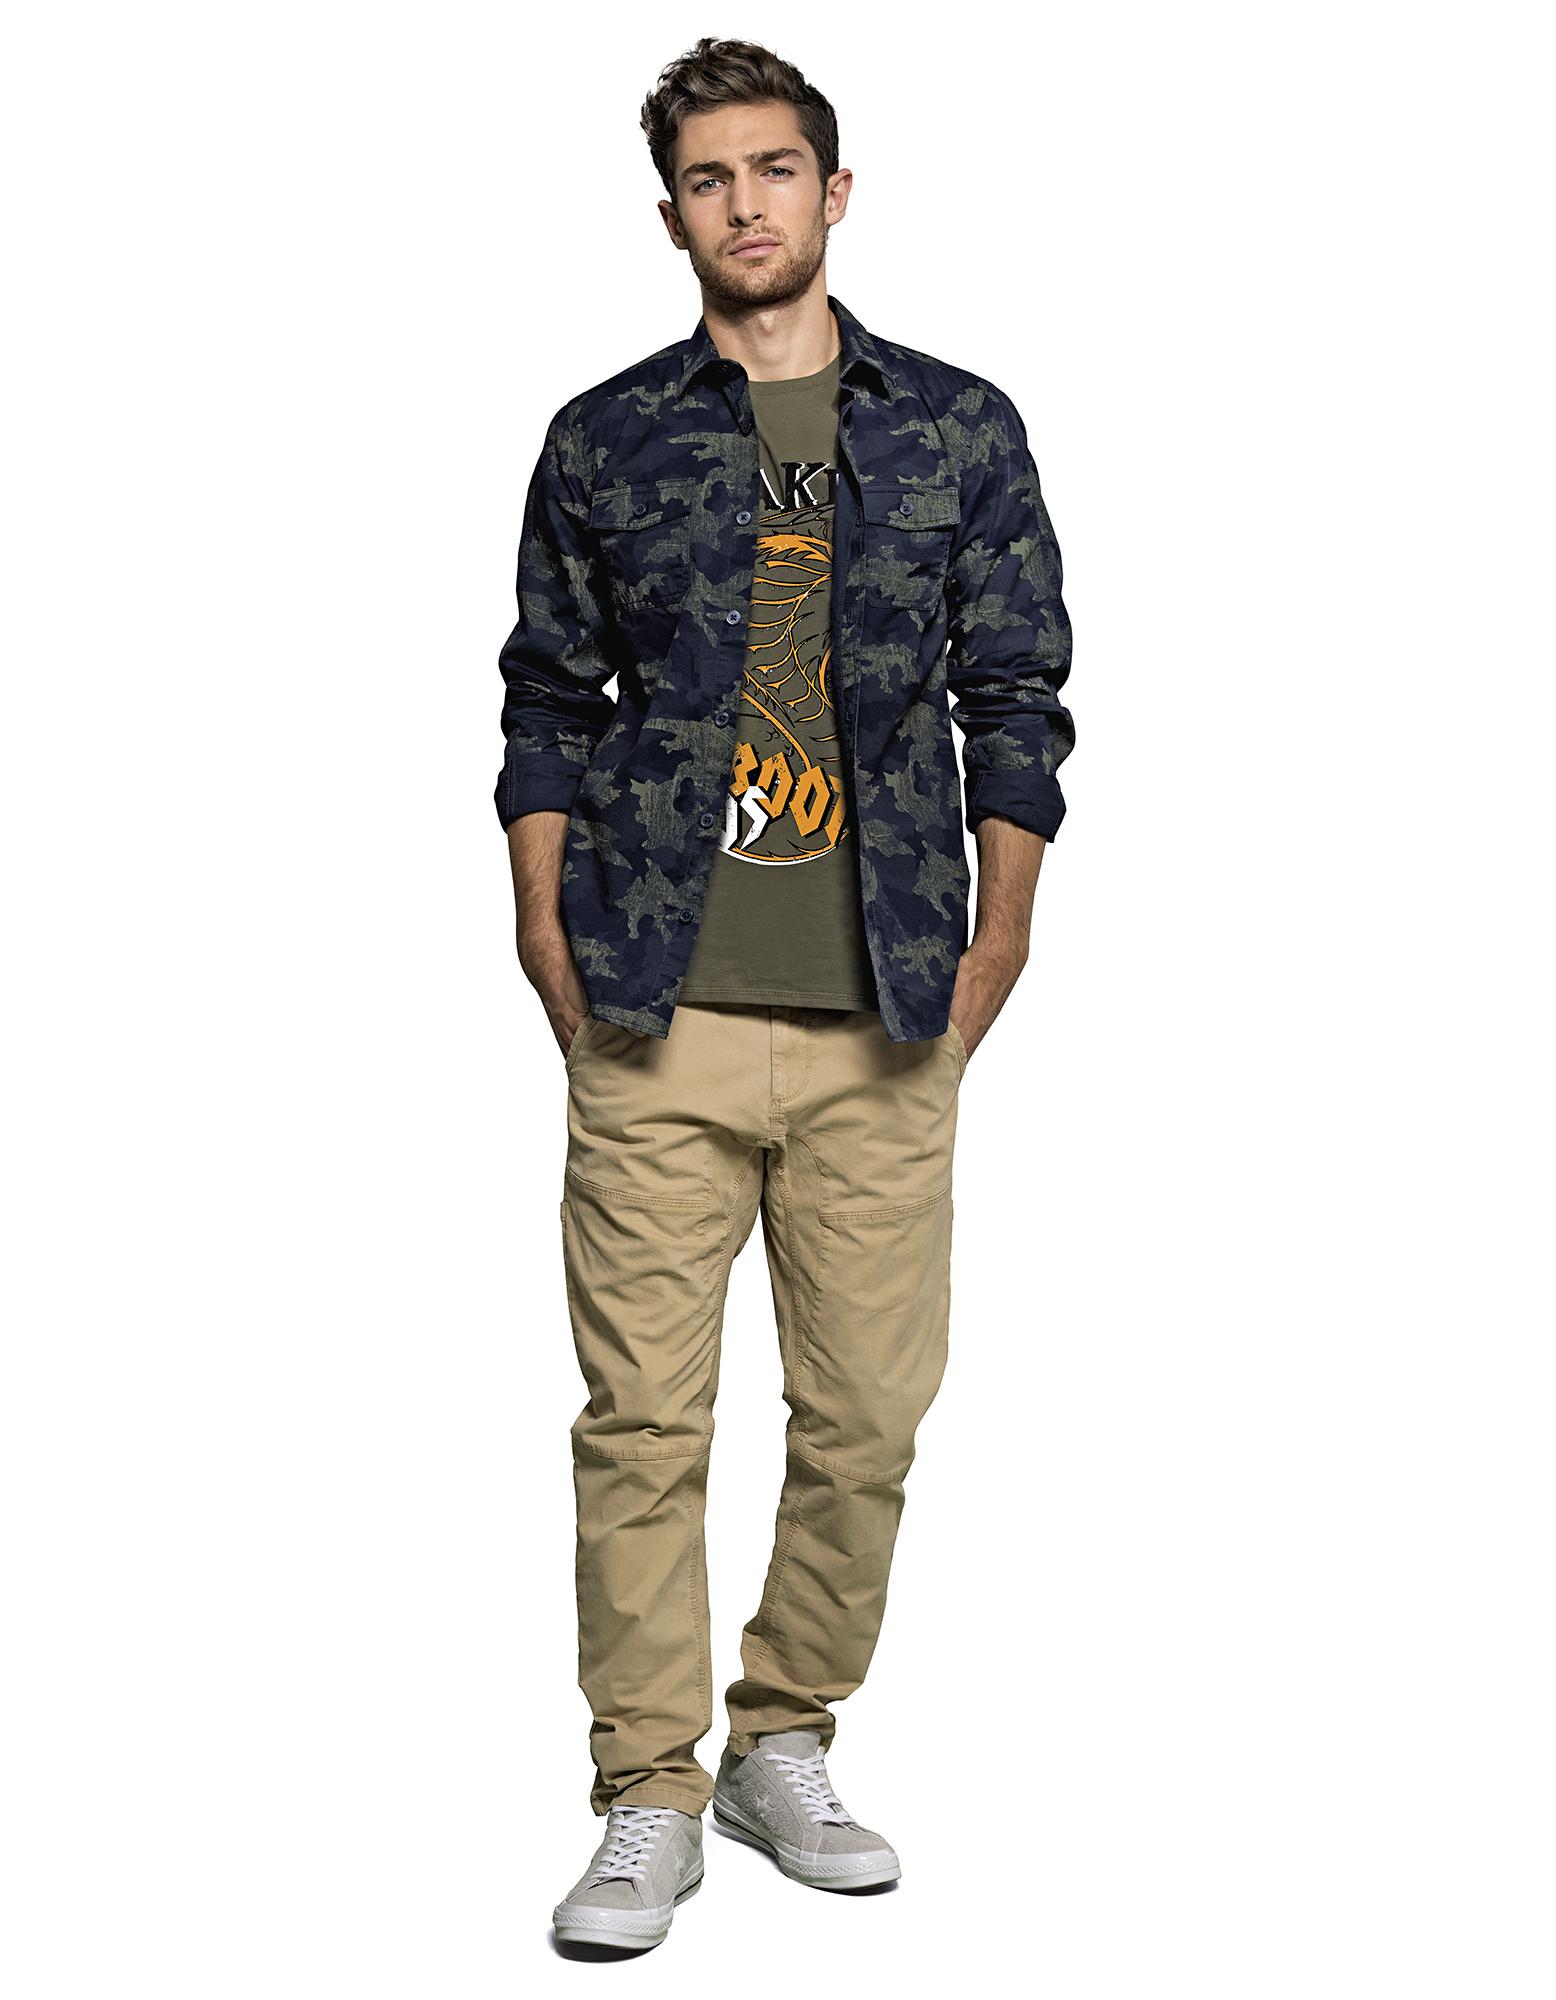 herren hemd mit camouflage muster takko fashion. Black Bedroom Furniture Sets. Home Design Ideas